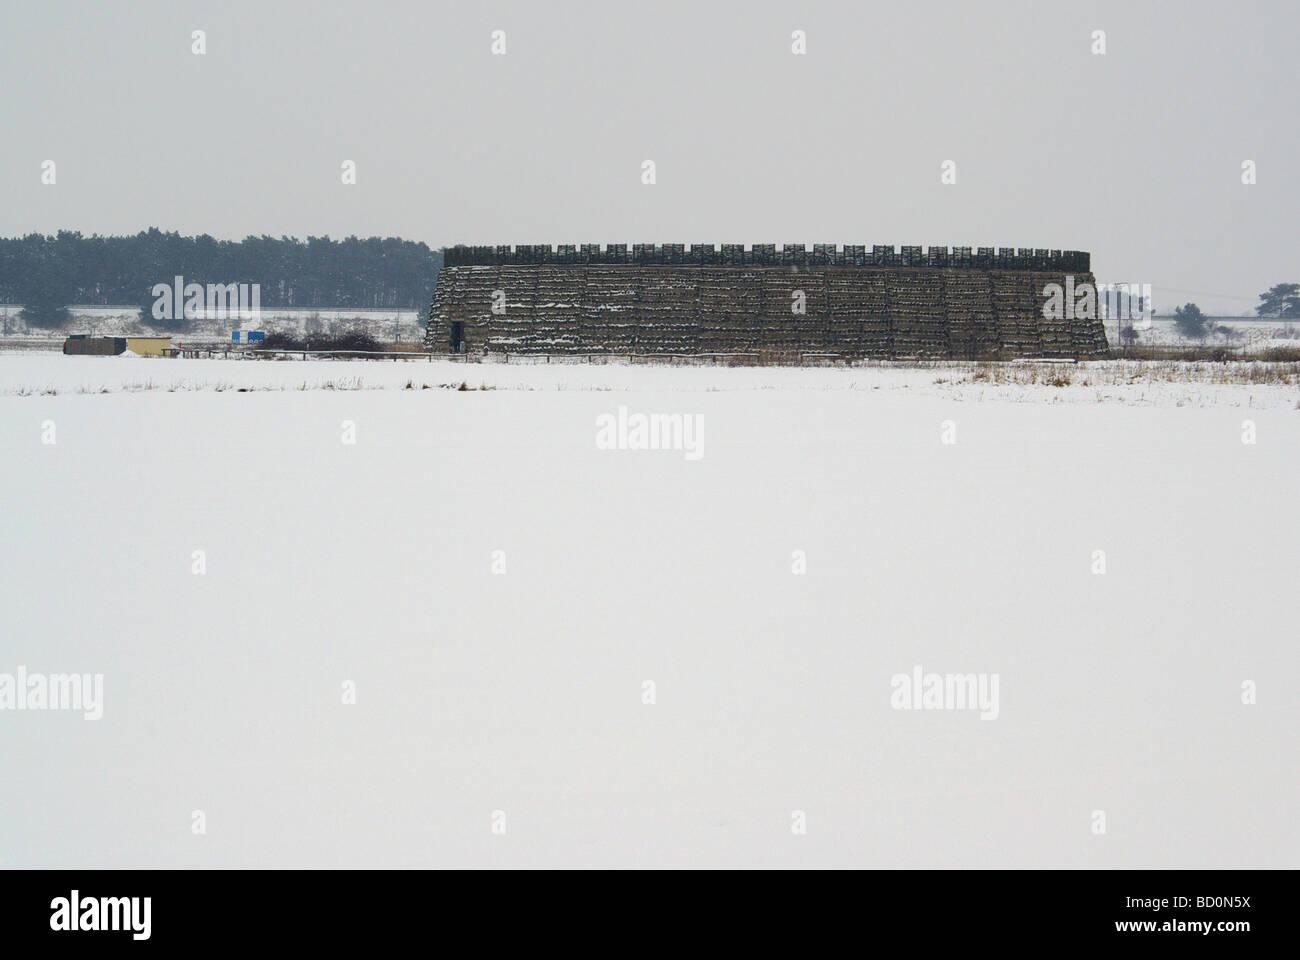 Raddusch Slawenburg Raddusch Slavic Fort 02 - Stock Image